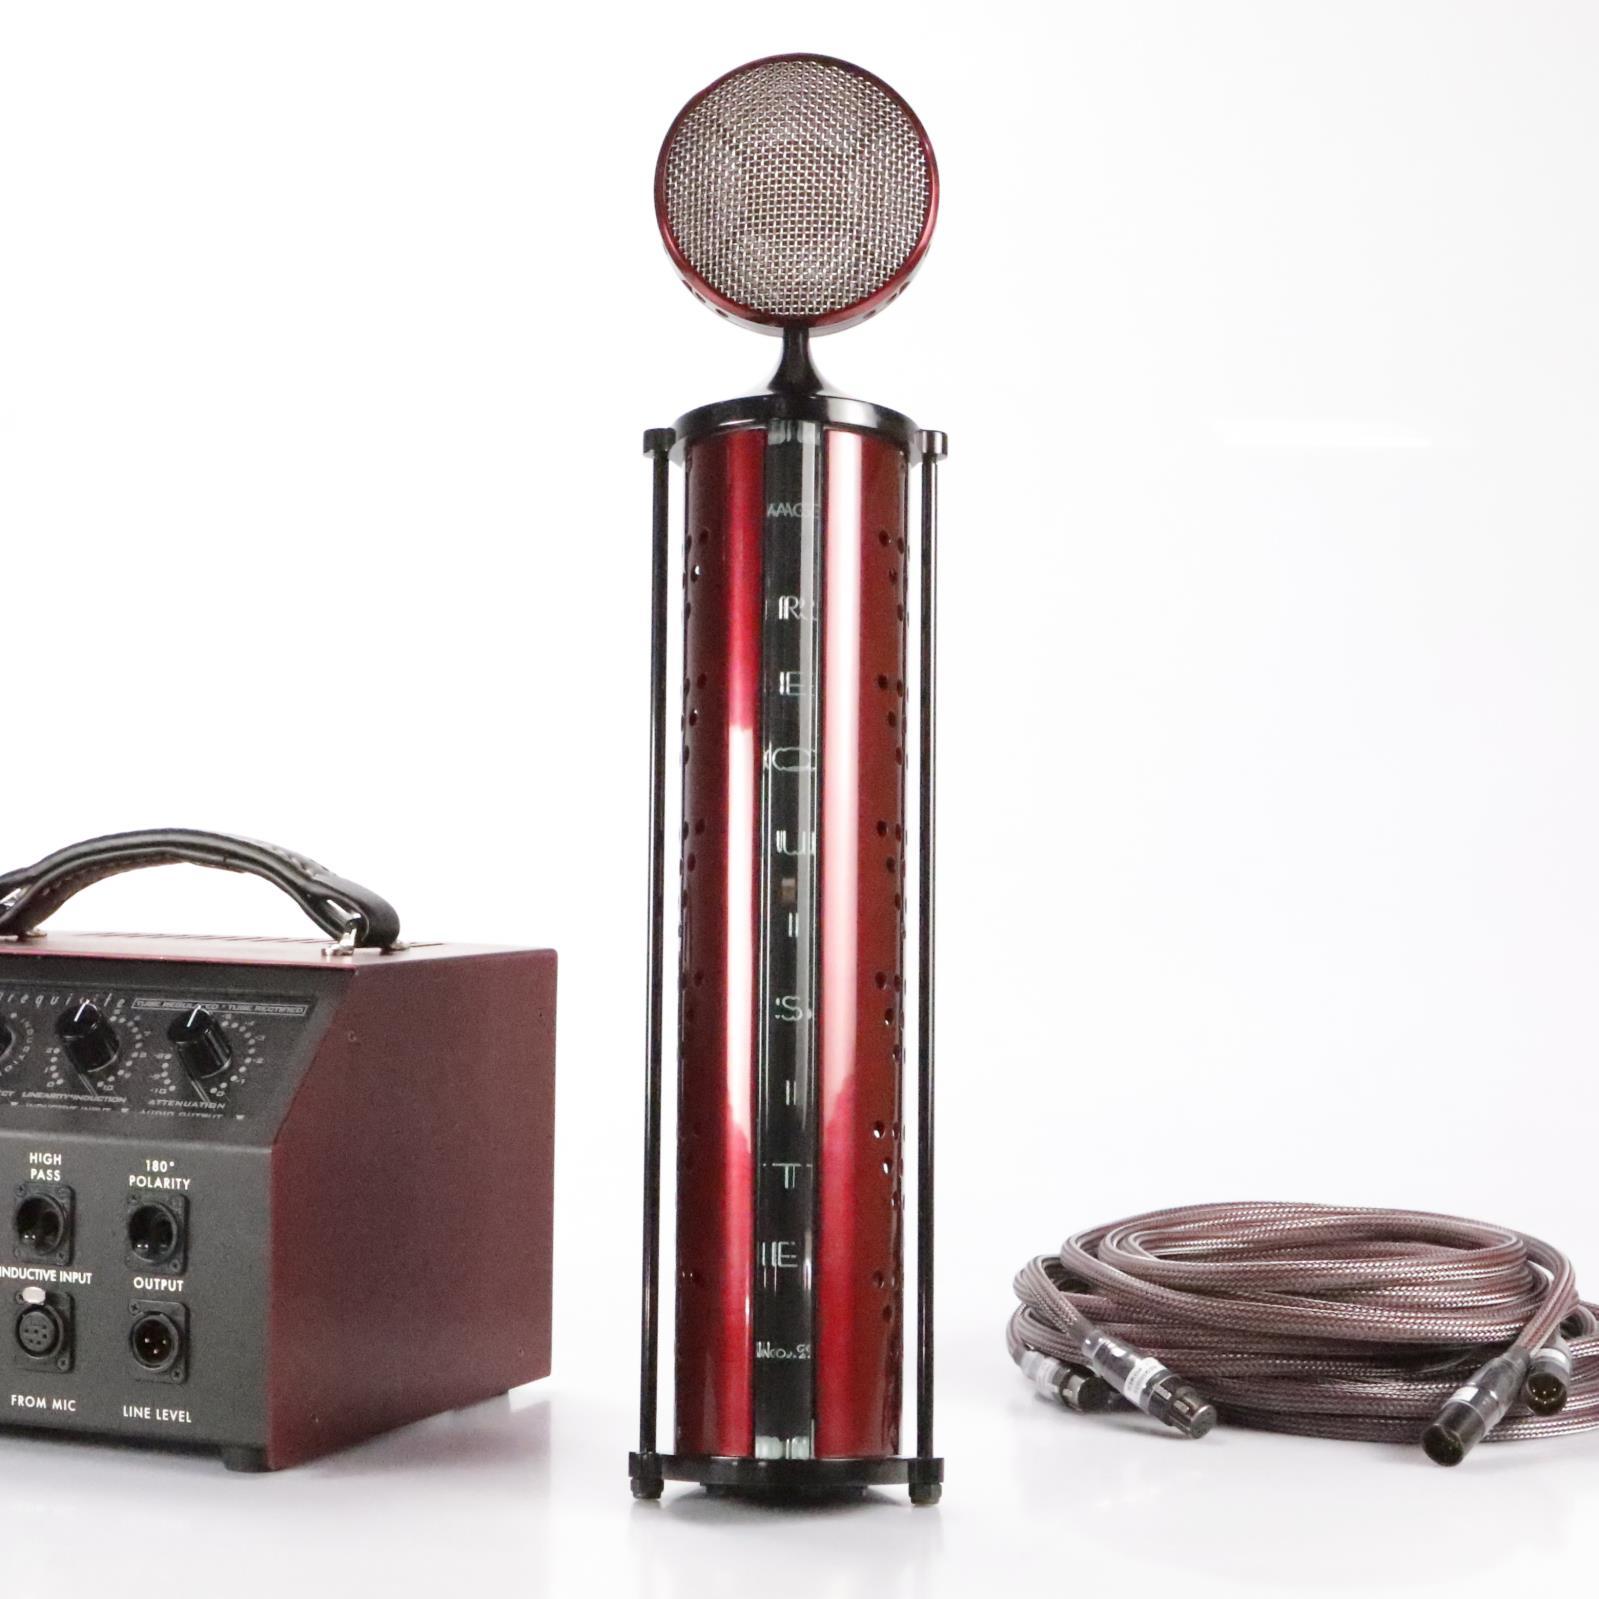 Requisite Audio L7 Line Level 9-Pattern +32dB Condenser Tube Microphone #36261